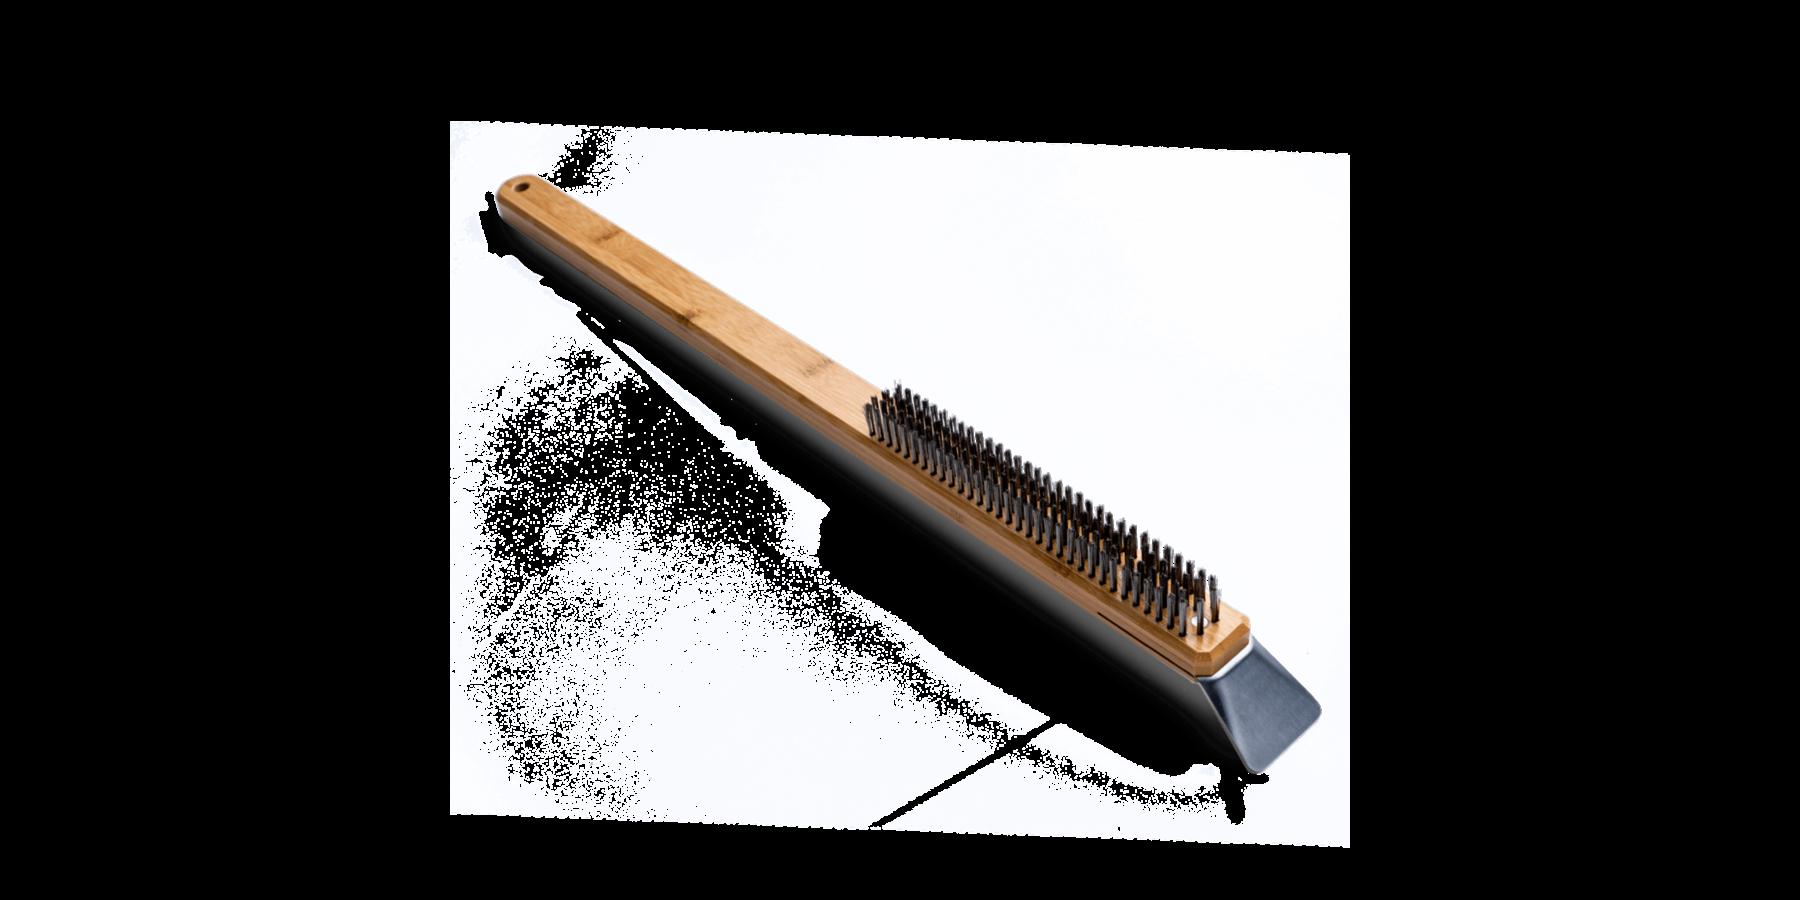 Oven Brush/Borstel